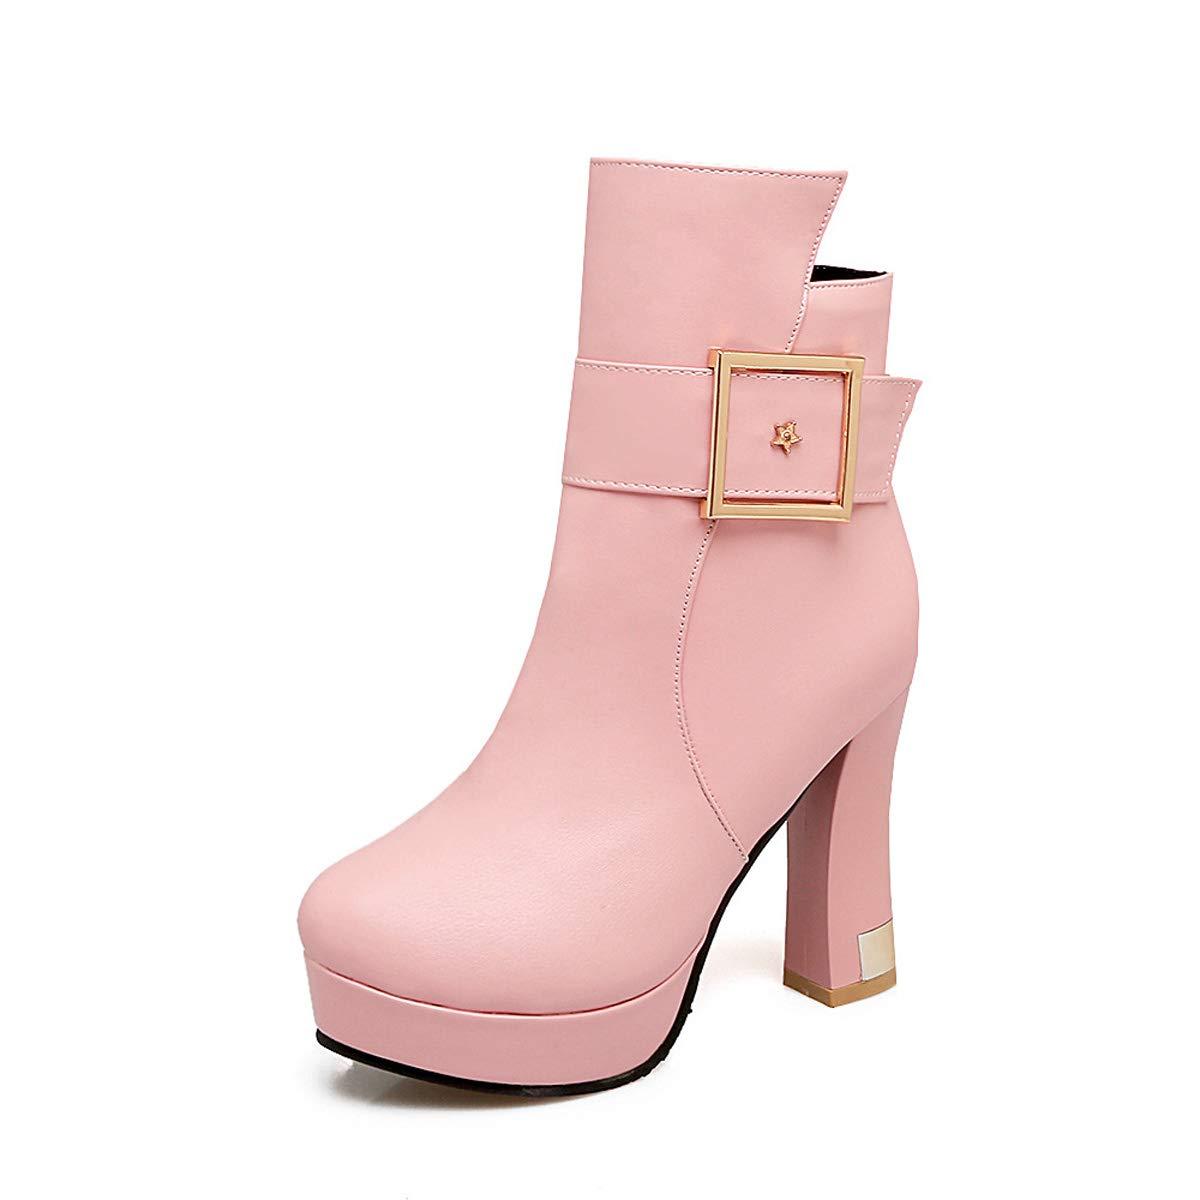 DANDANJIE Frauen Stiefel Plattform High Heel Stiefeletten Damen Chunky Heel Schnalle Herbst & Winter Warme Stiefel Rosa 35EU